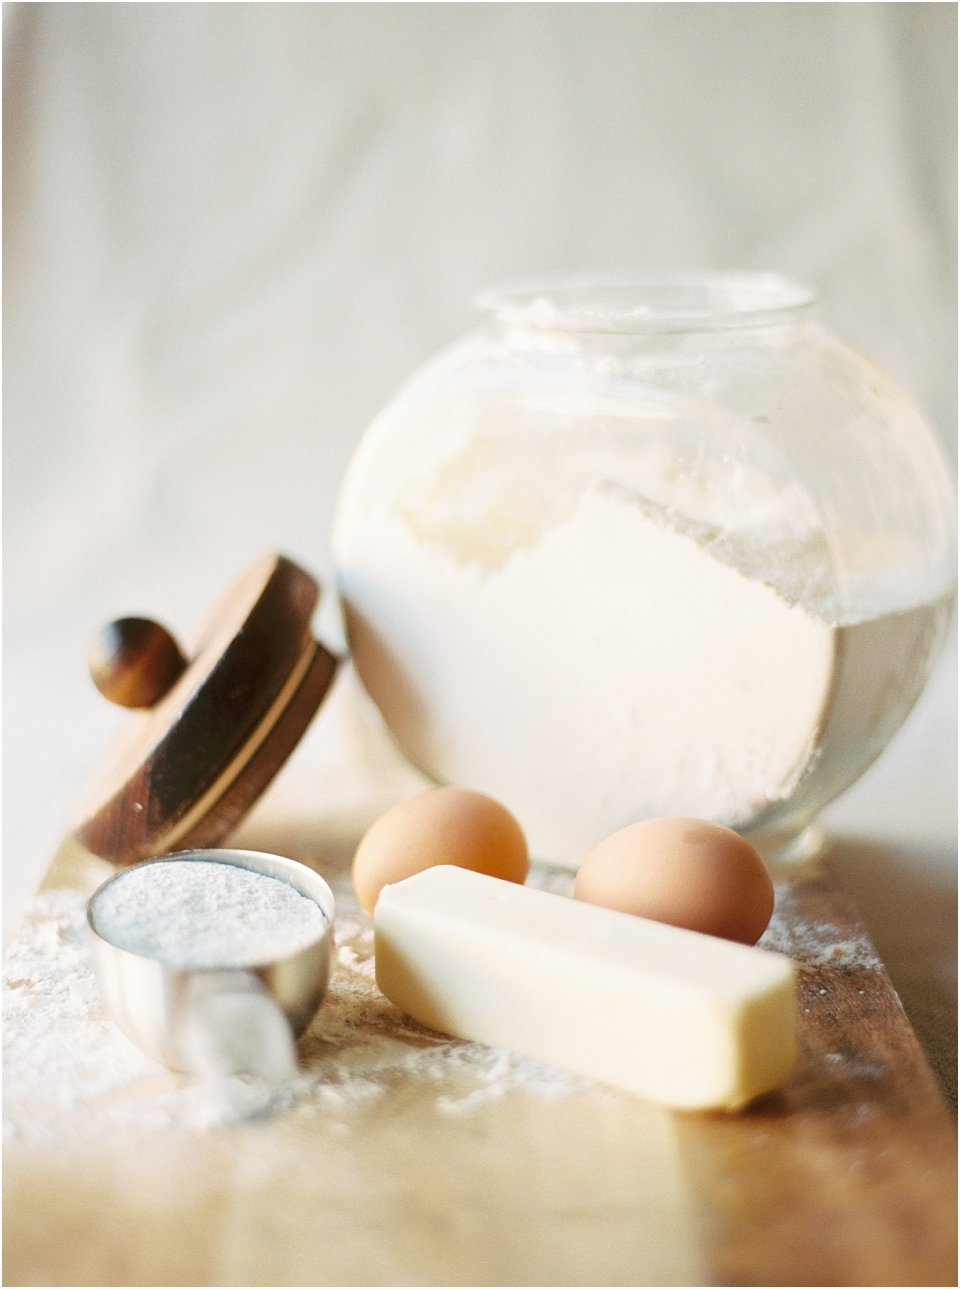 Jessica Christine Photography - Cranberry White Chocolate Biscotti